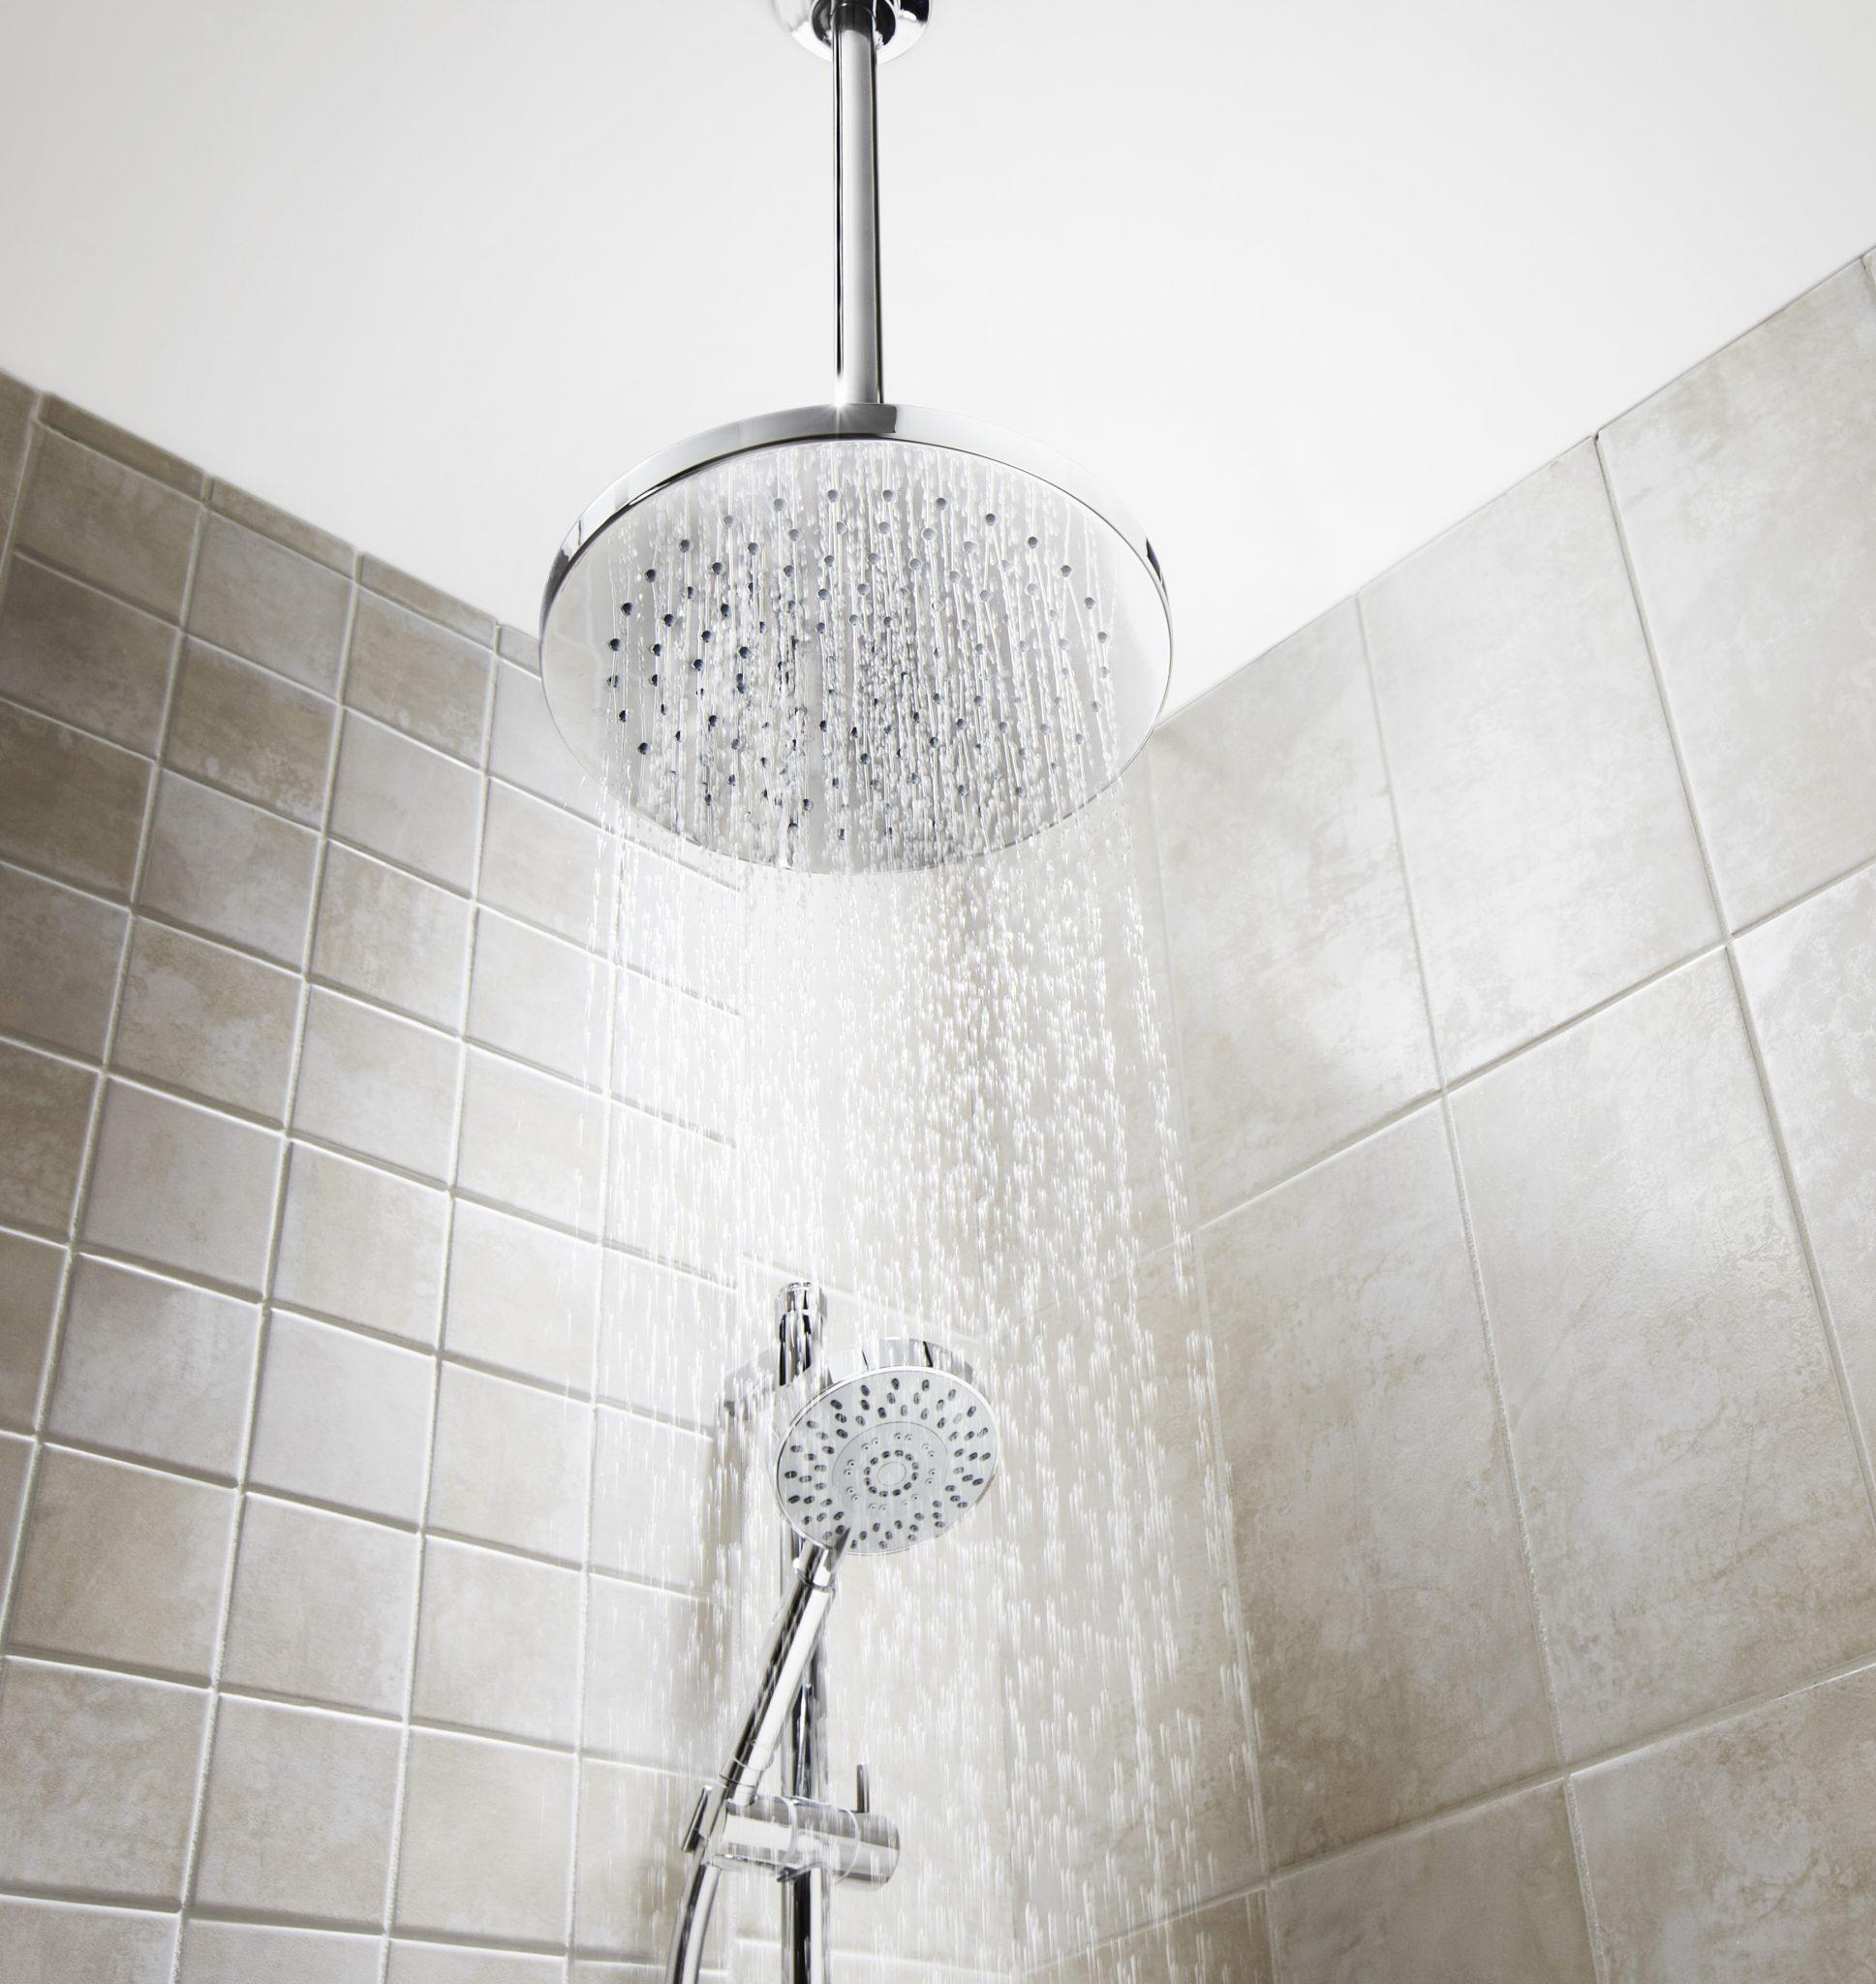 Aqualisa Rise - Herts Bathrooms - Herts Bathrooms